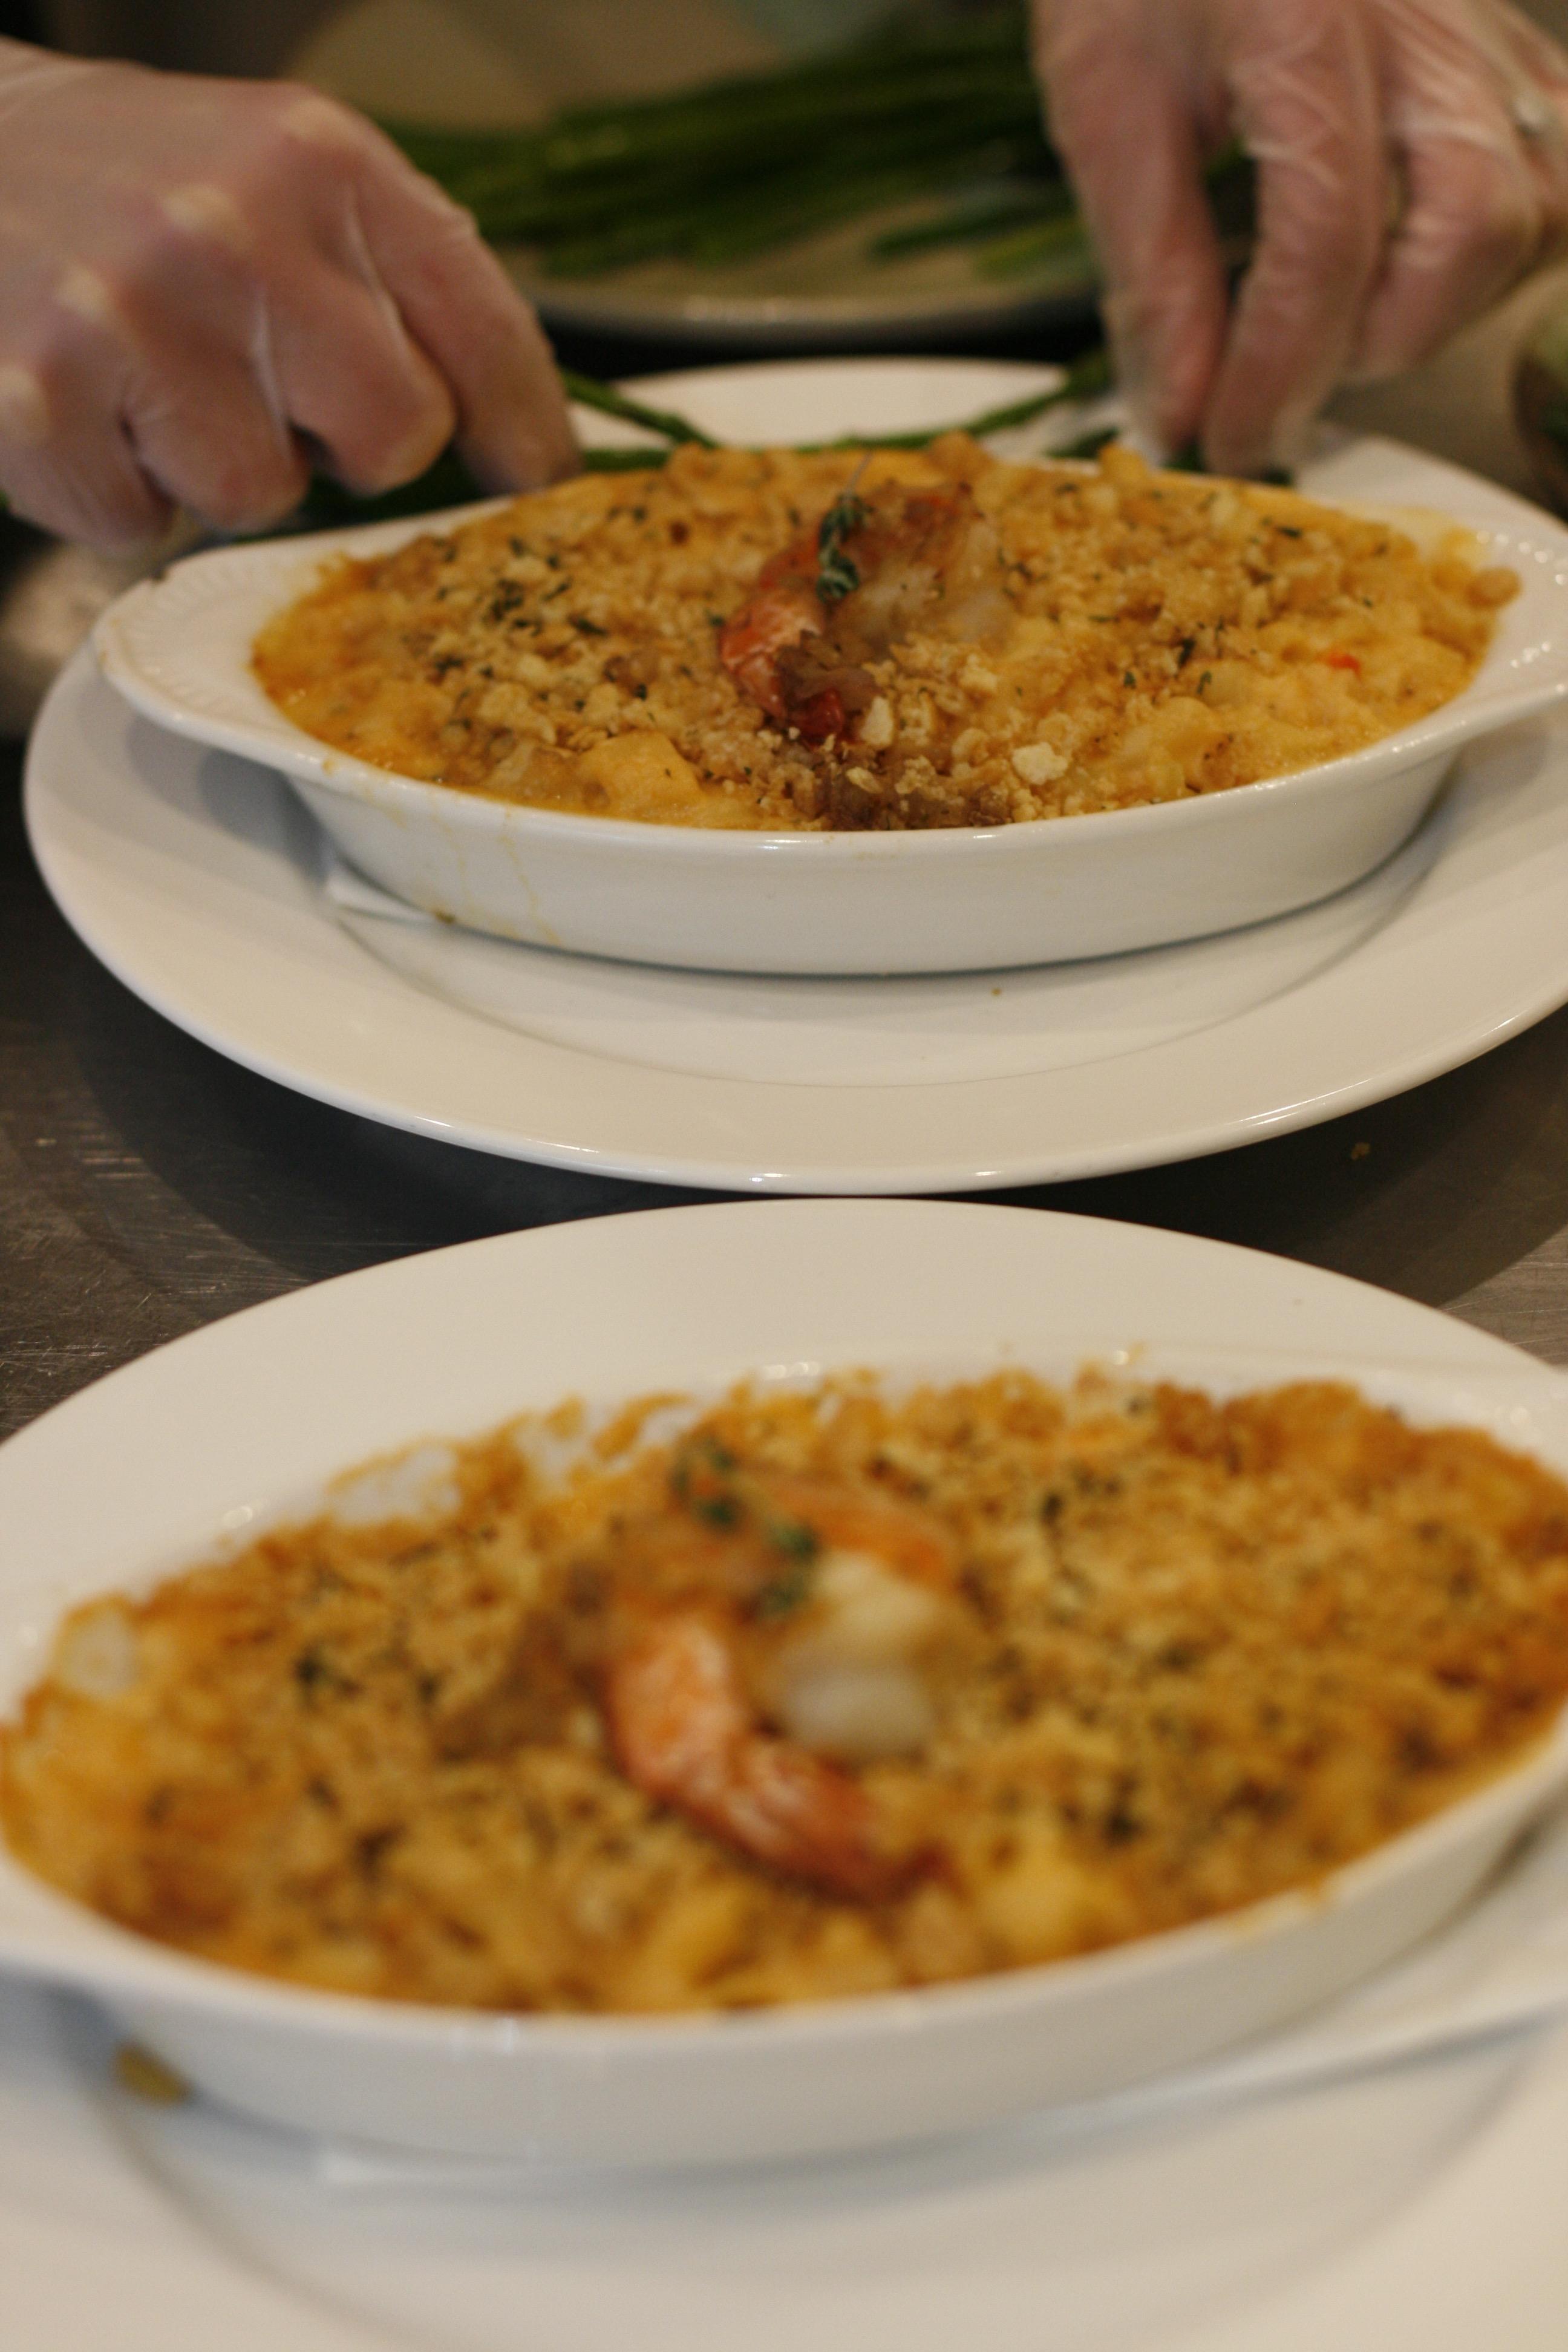 Lobster & Shrimp Mac 'n Cheese